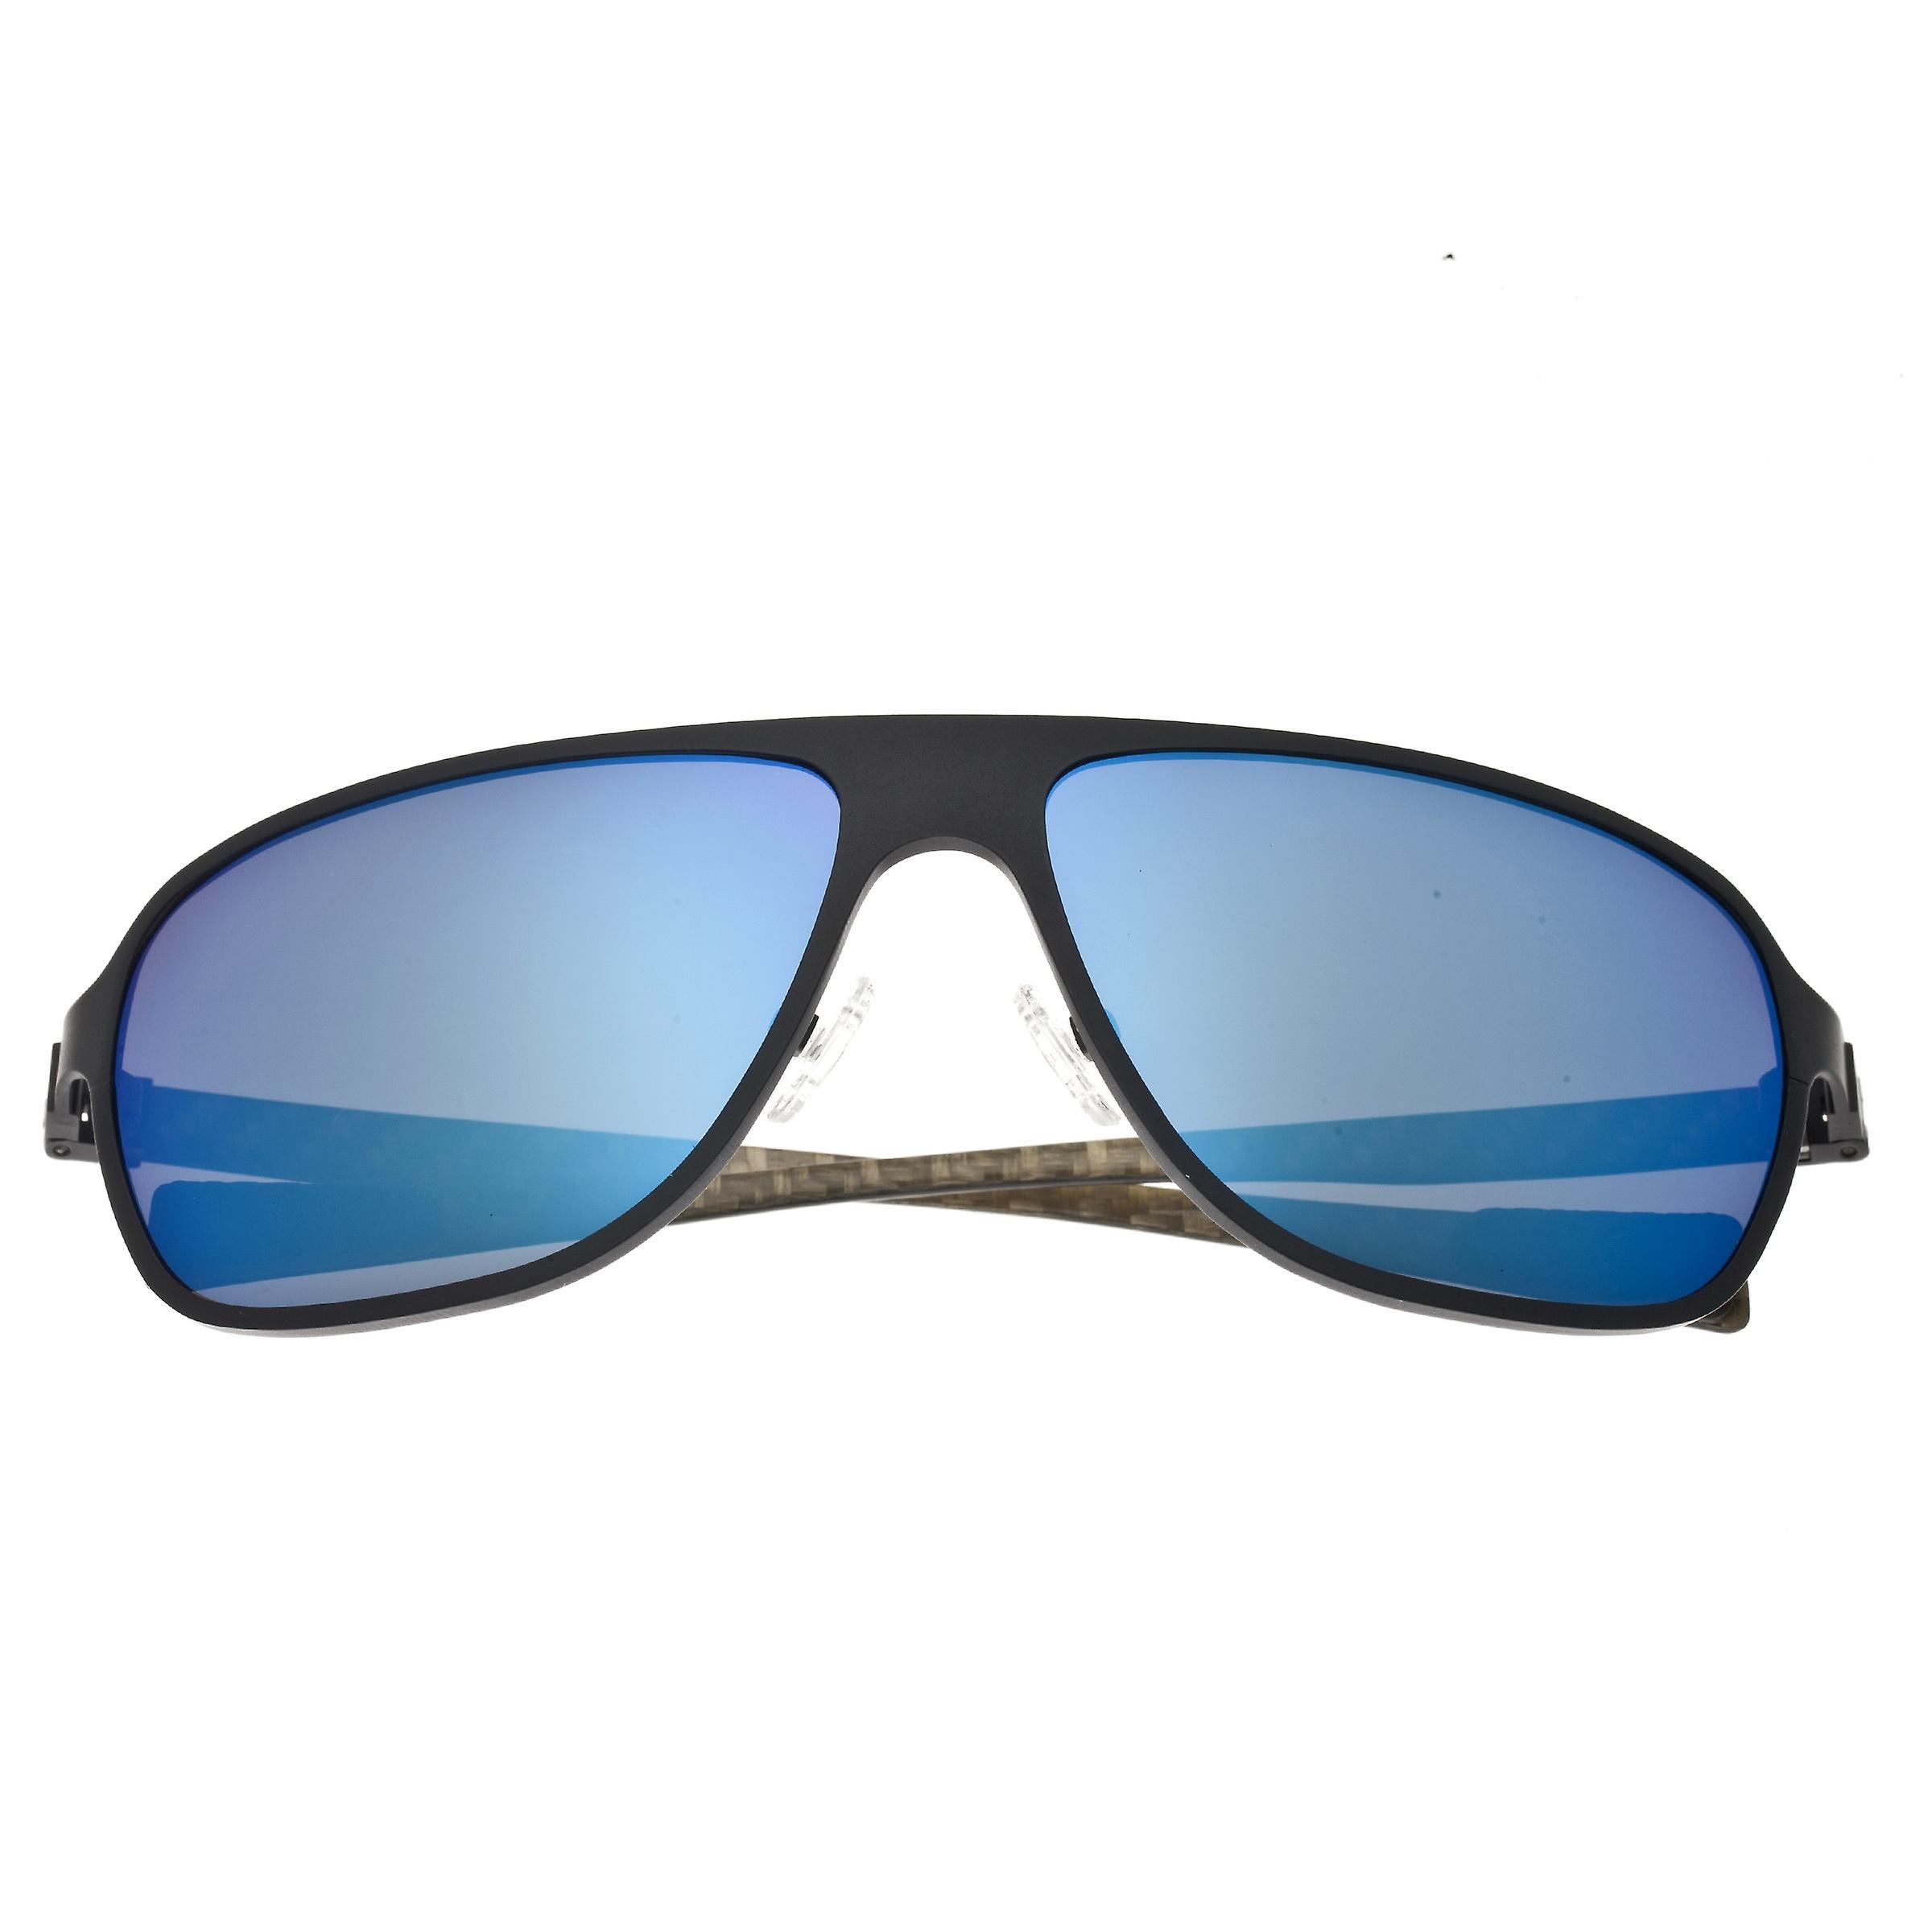 Breed Atmosphere Titanium And Carbon Fiber Polarized Sunglasses - Black/Blue